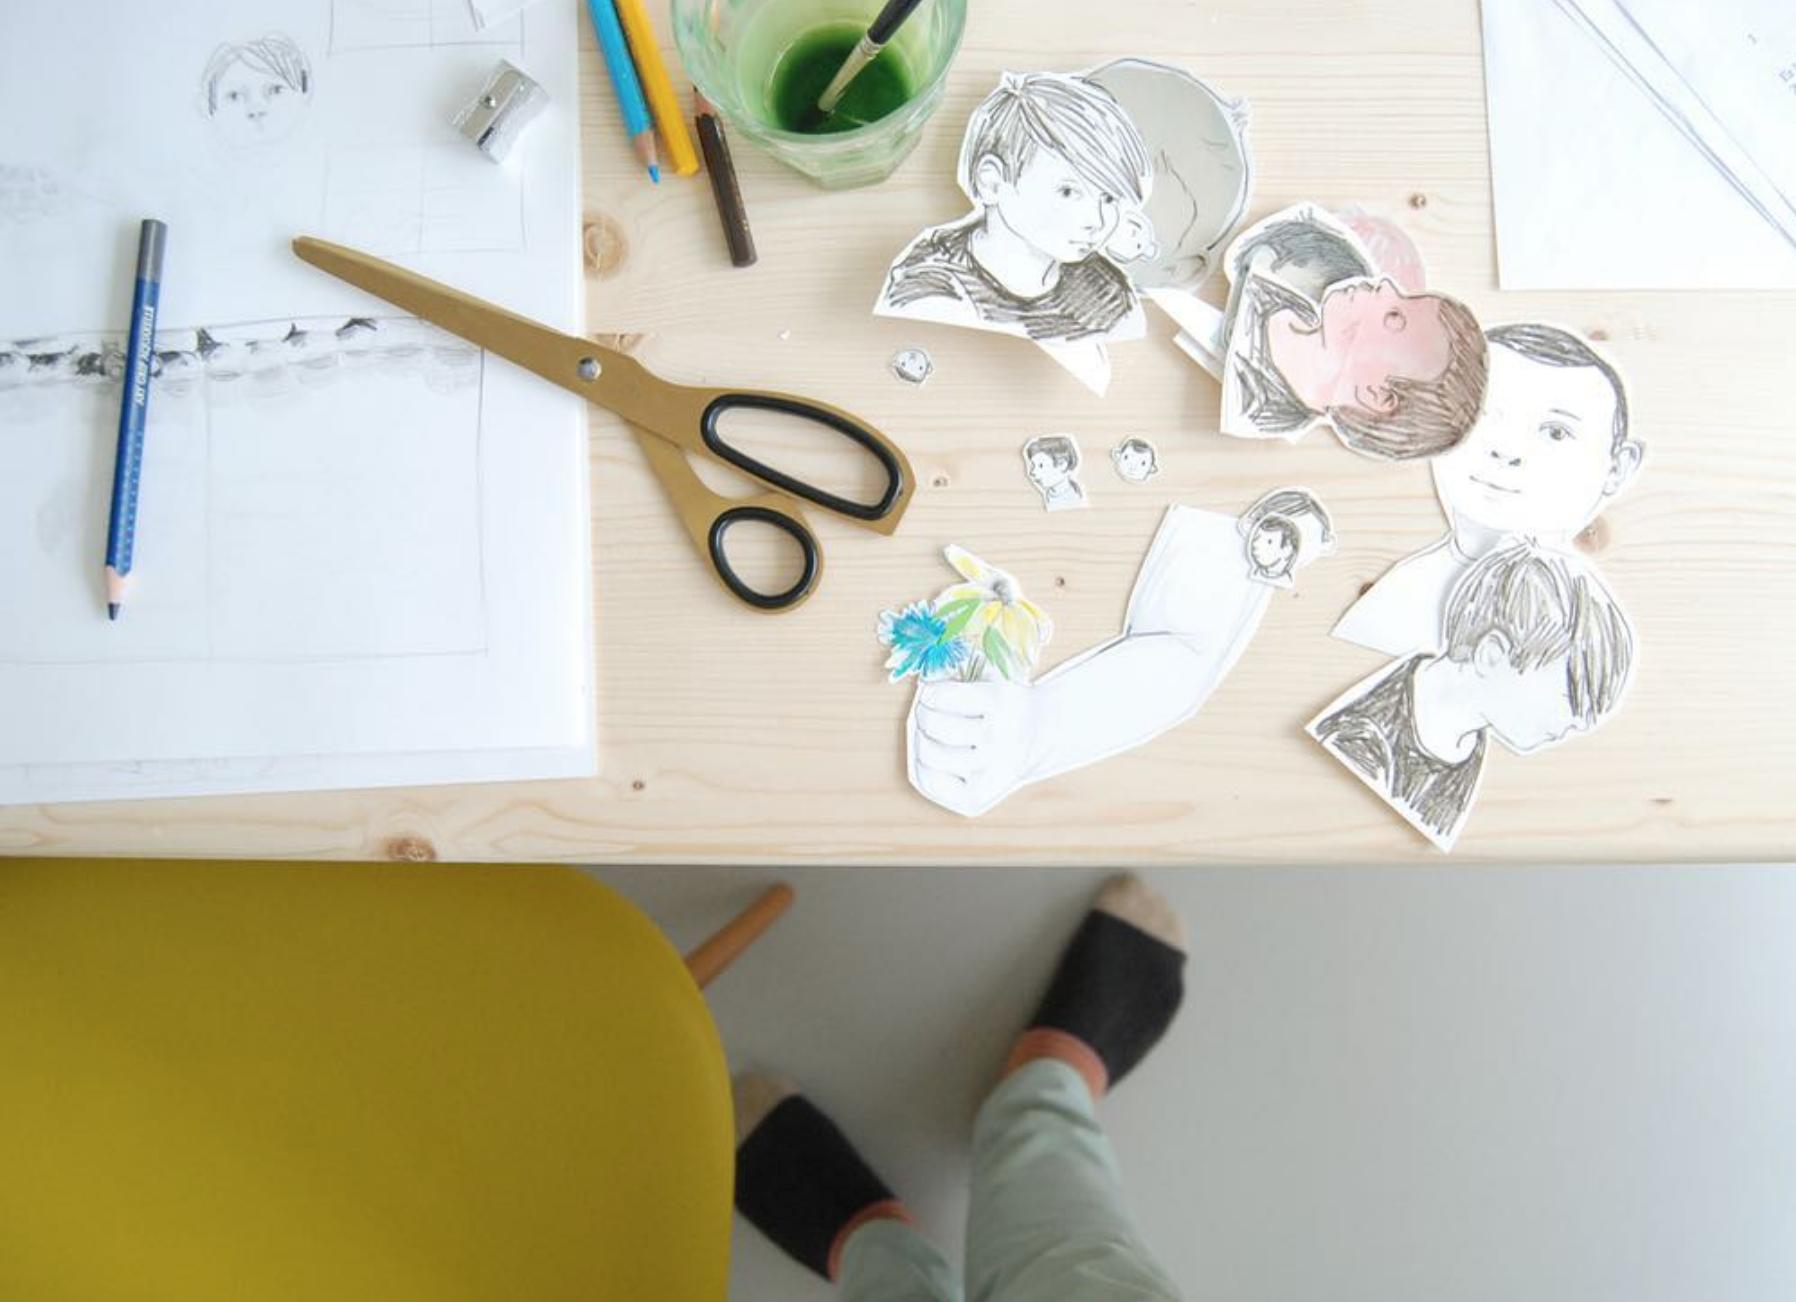 Where Makers Make_Ruth Hengeveld_Art Studio Tour_6.png